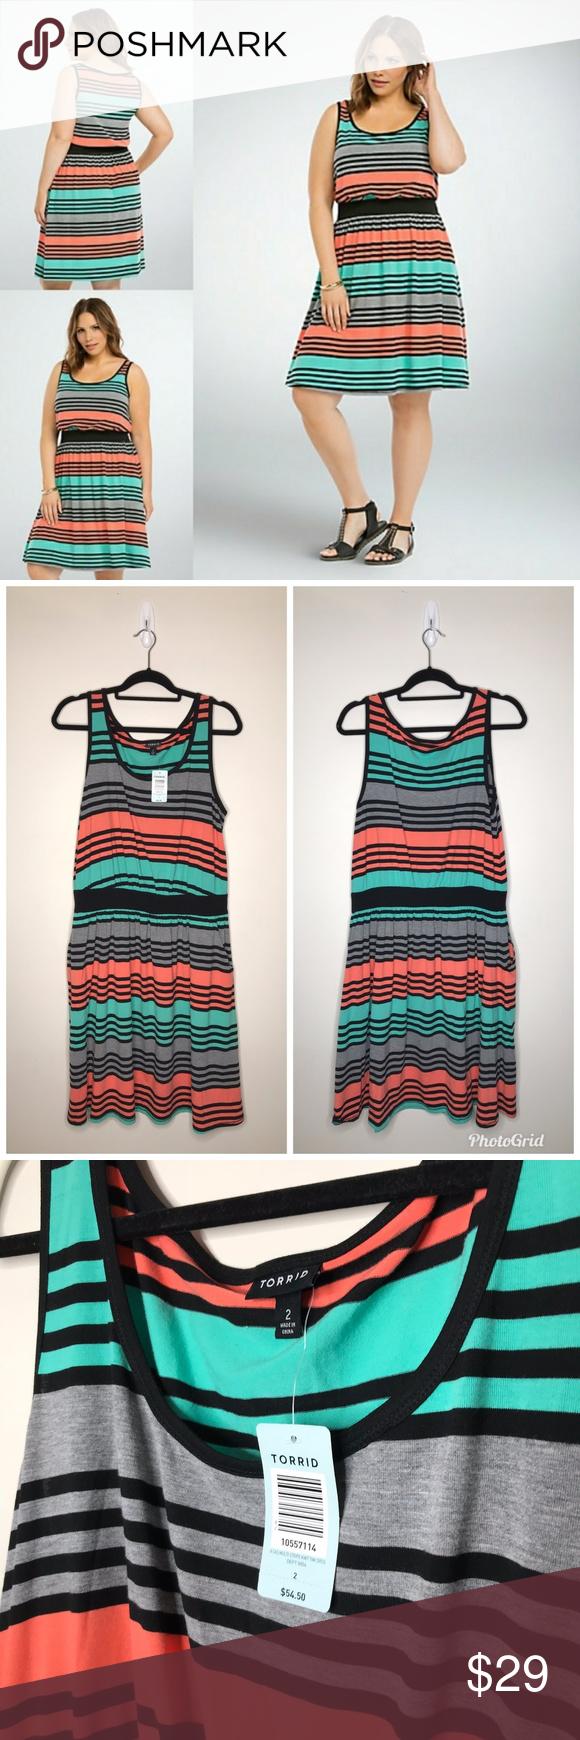 Torrid Striped Banded Tank Summer Dress 2x 215t0 Dresses 2x Summer Dresses Torrid Dresses [ 1740 x 580 Pixel ]